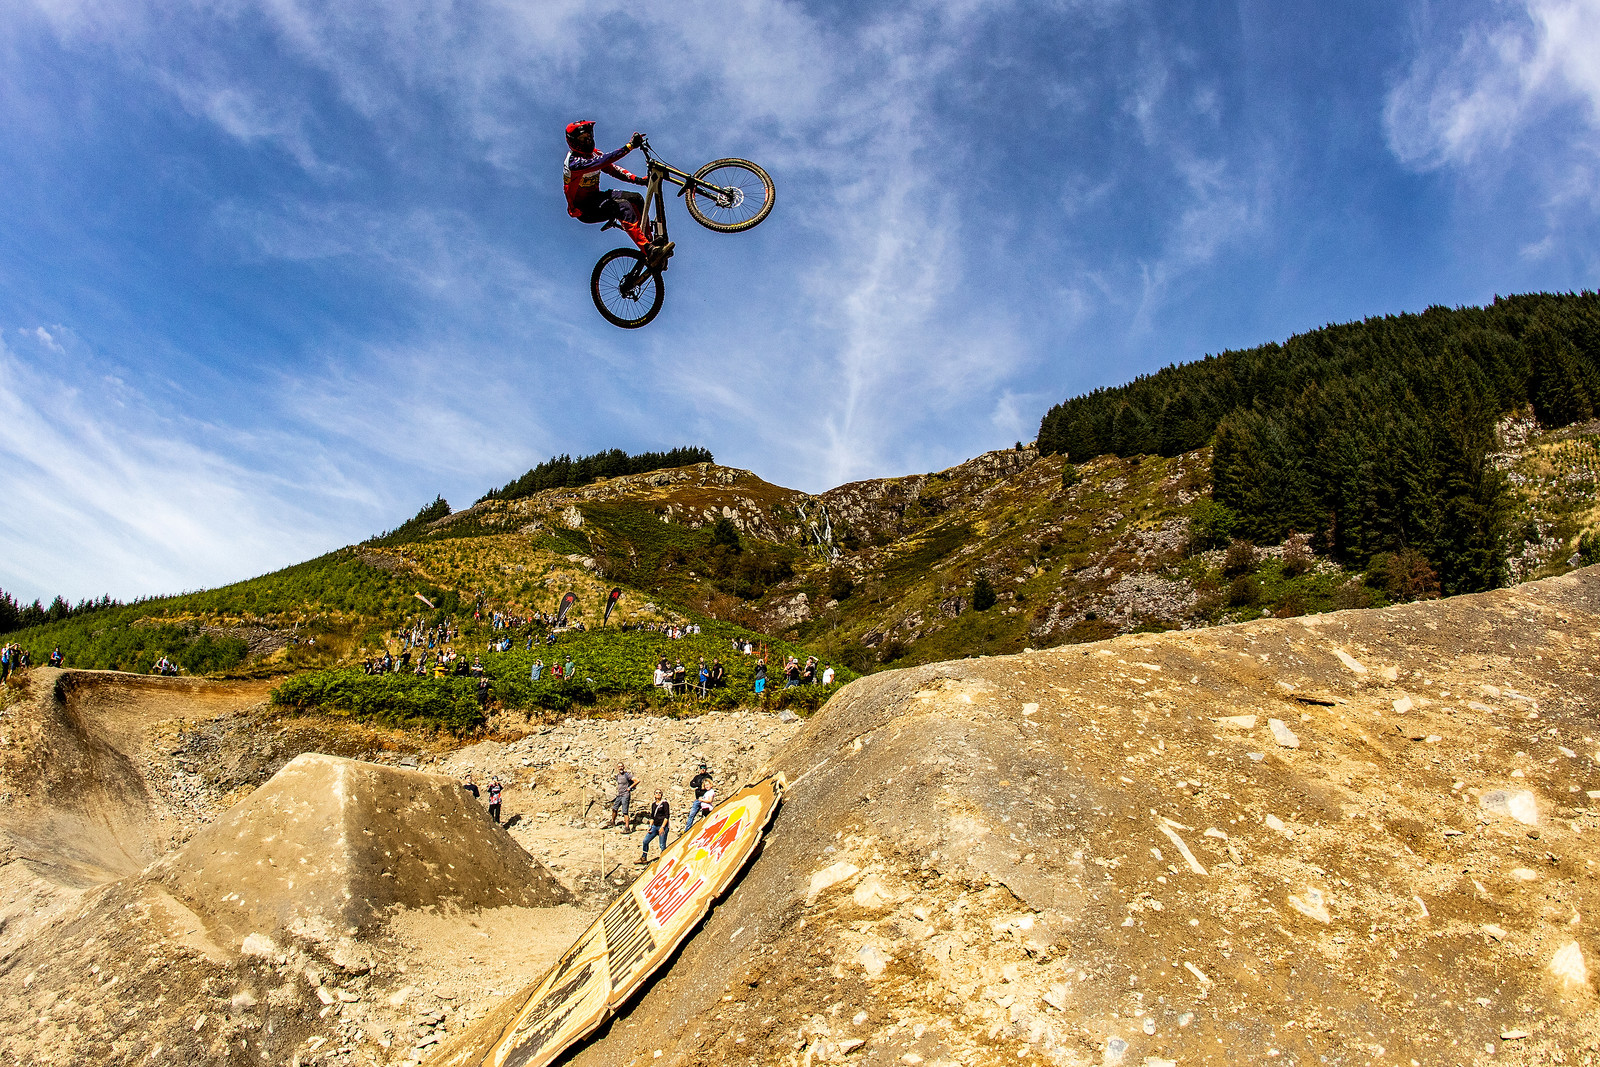 Harry Molloy - Red Bull Hardline in Photos - Mountain Biking Pictures - Vital MTB